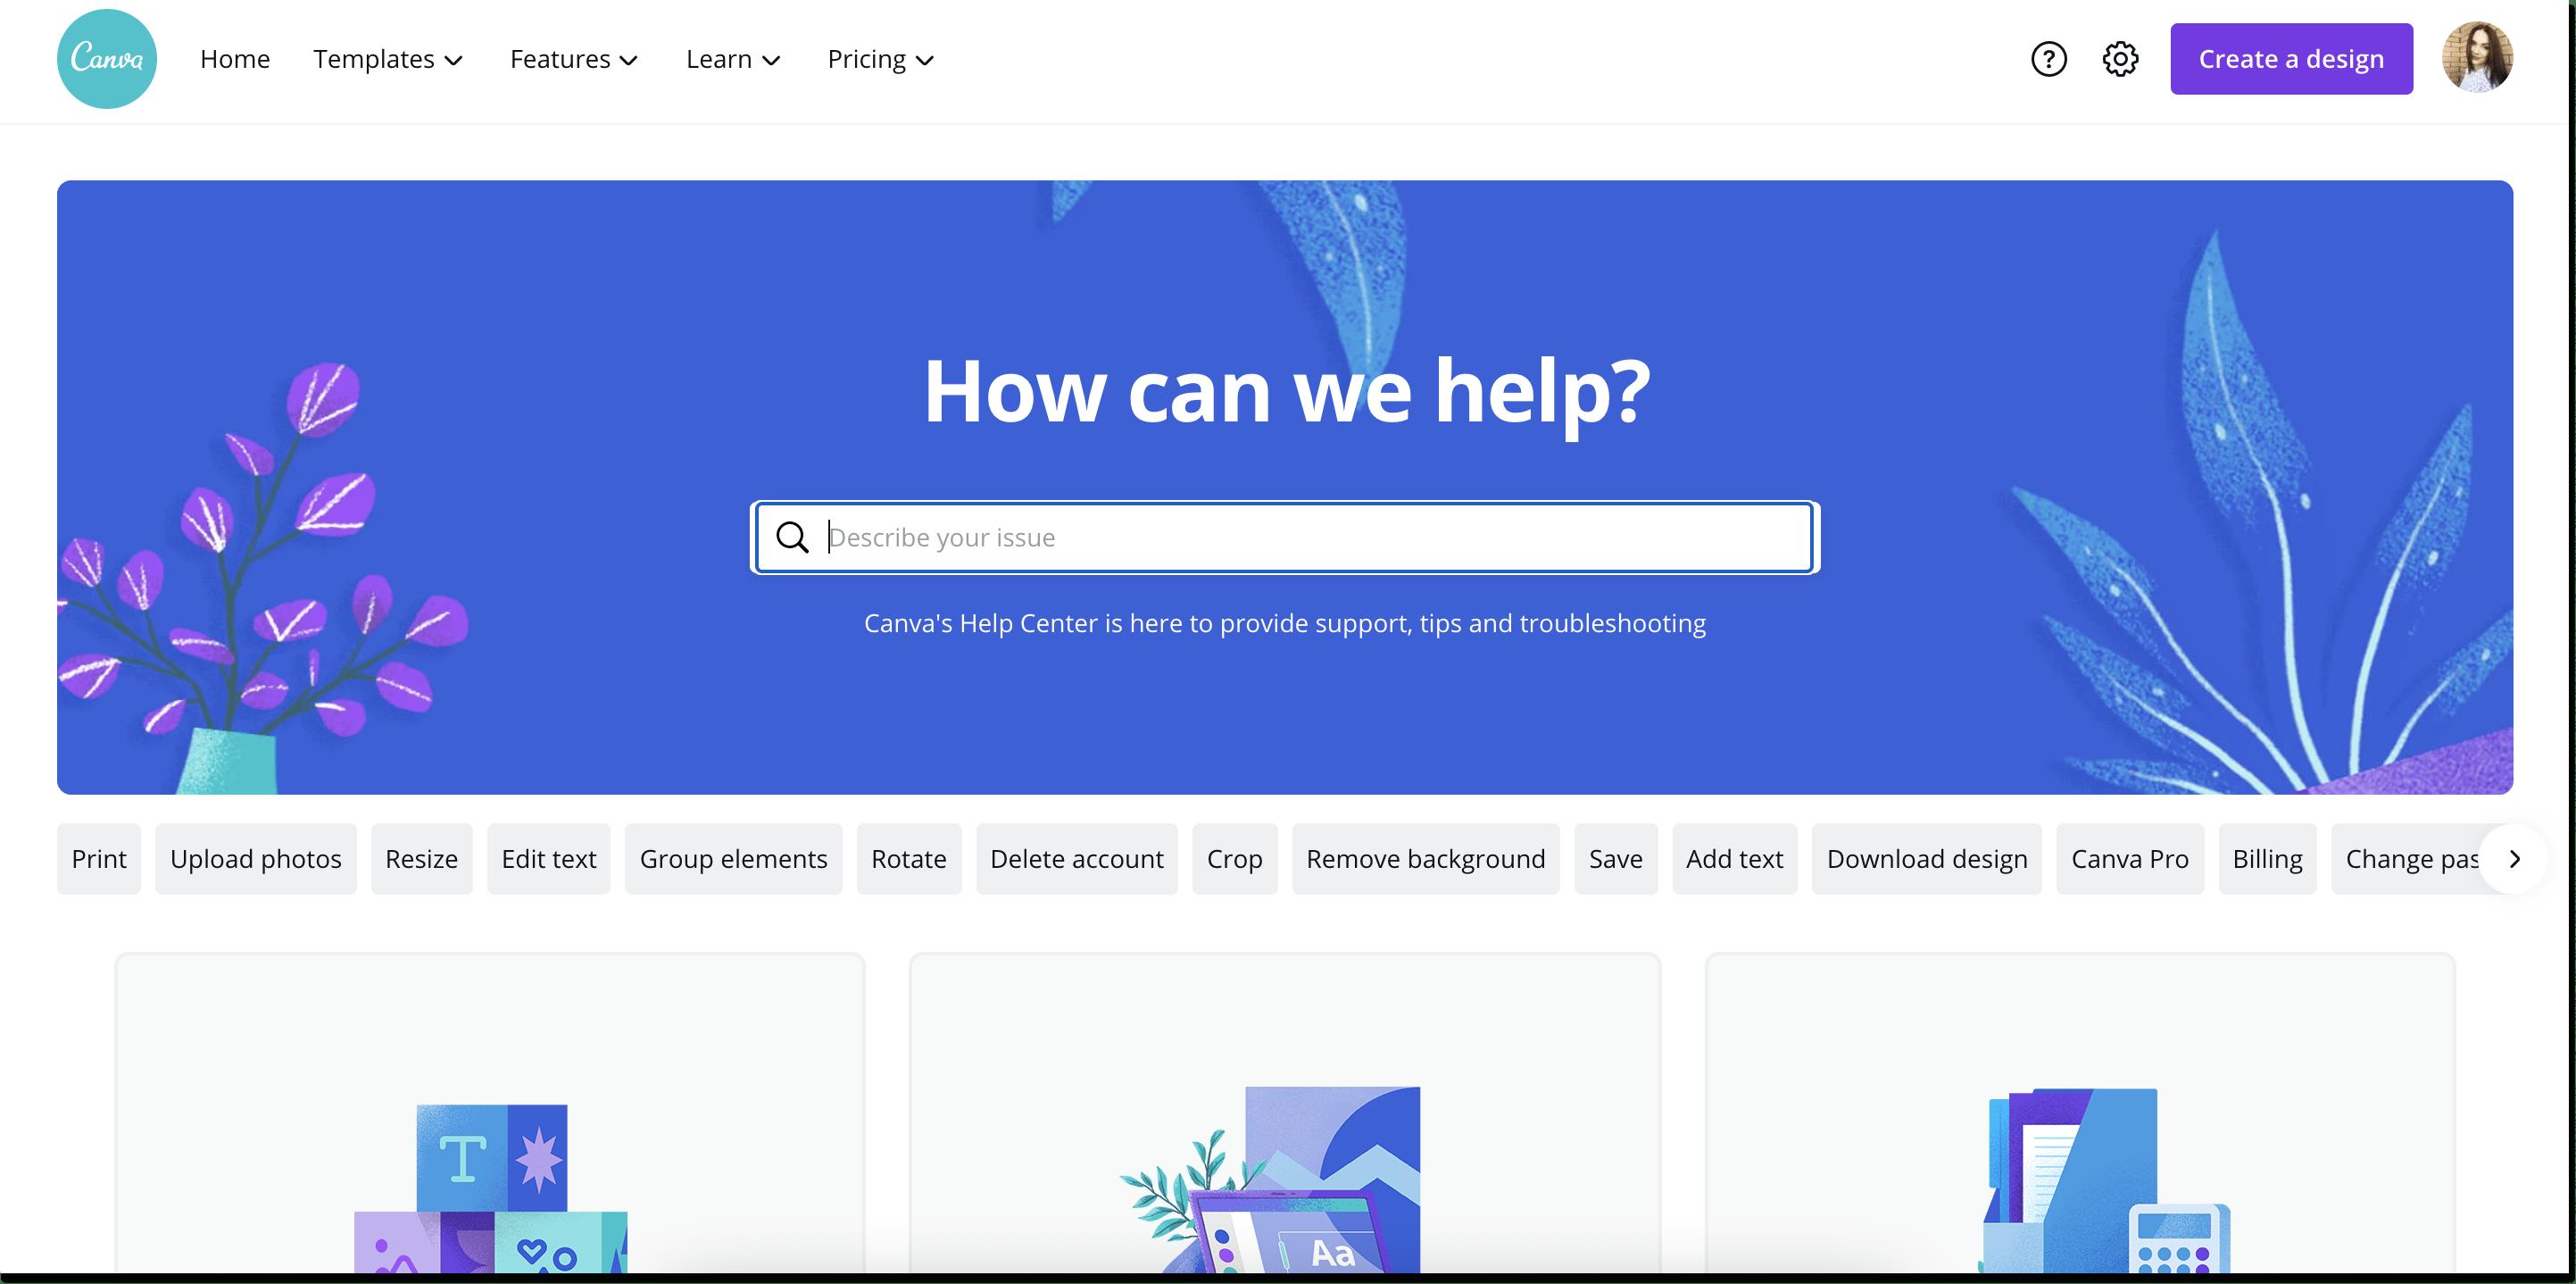 canva knowledge base